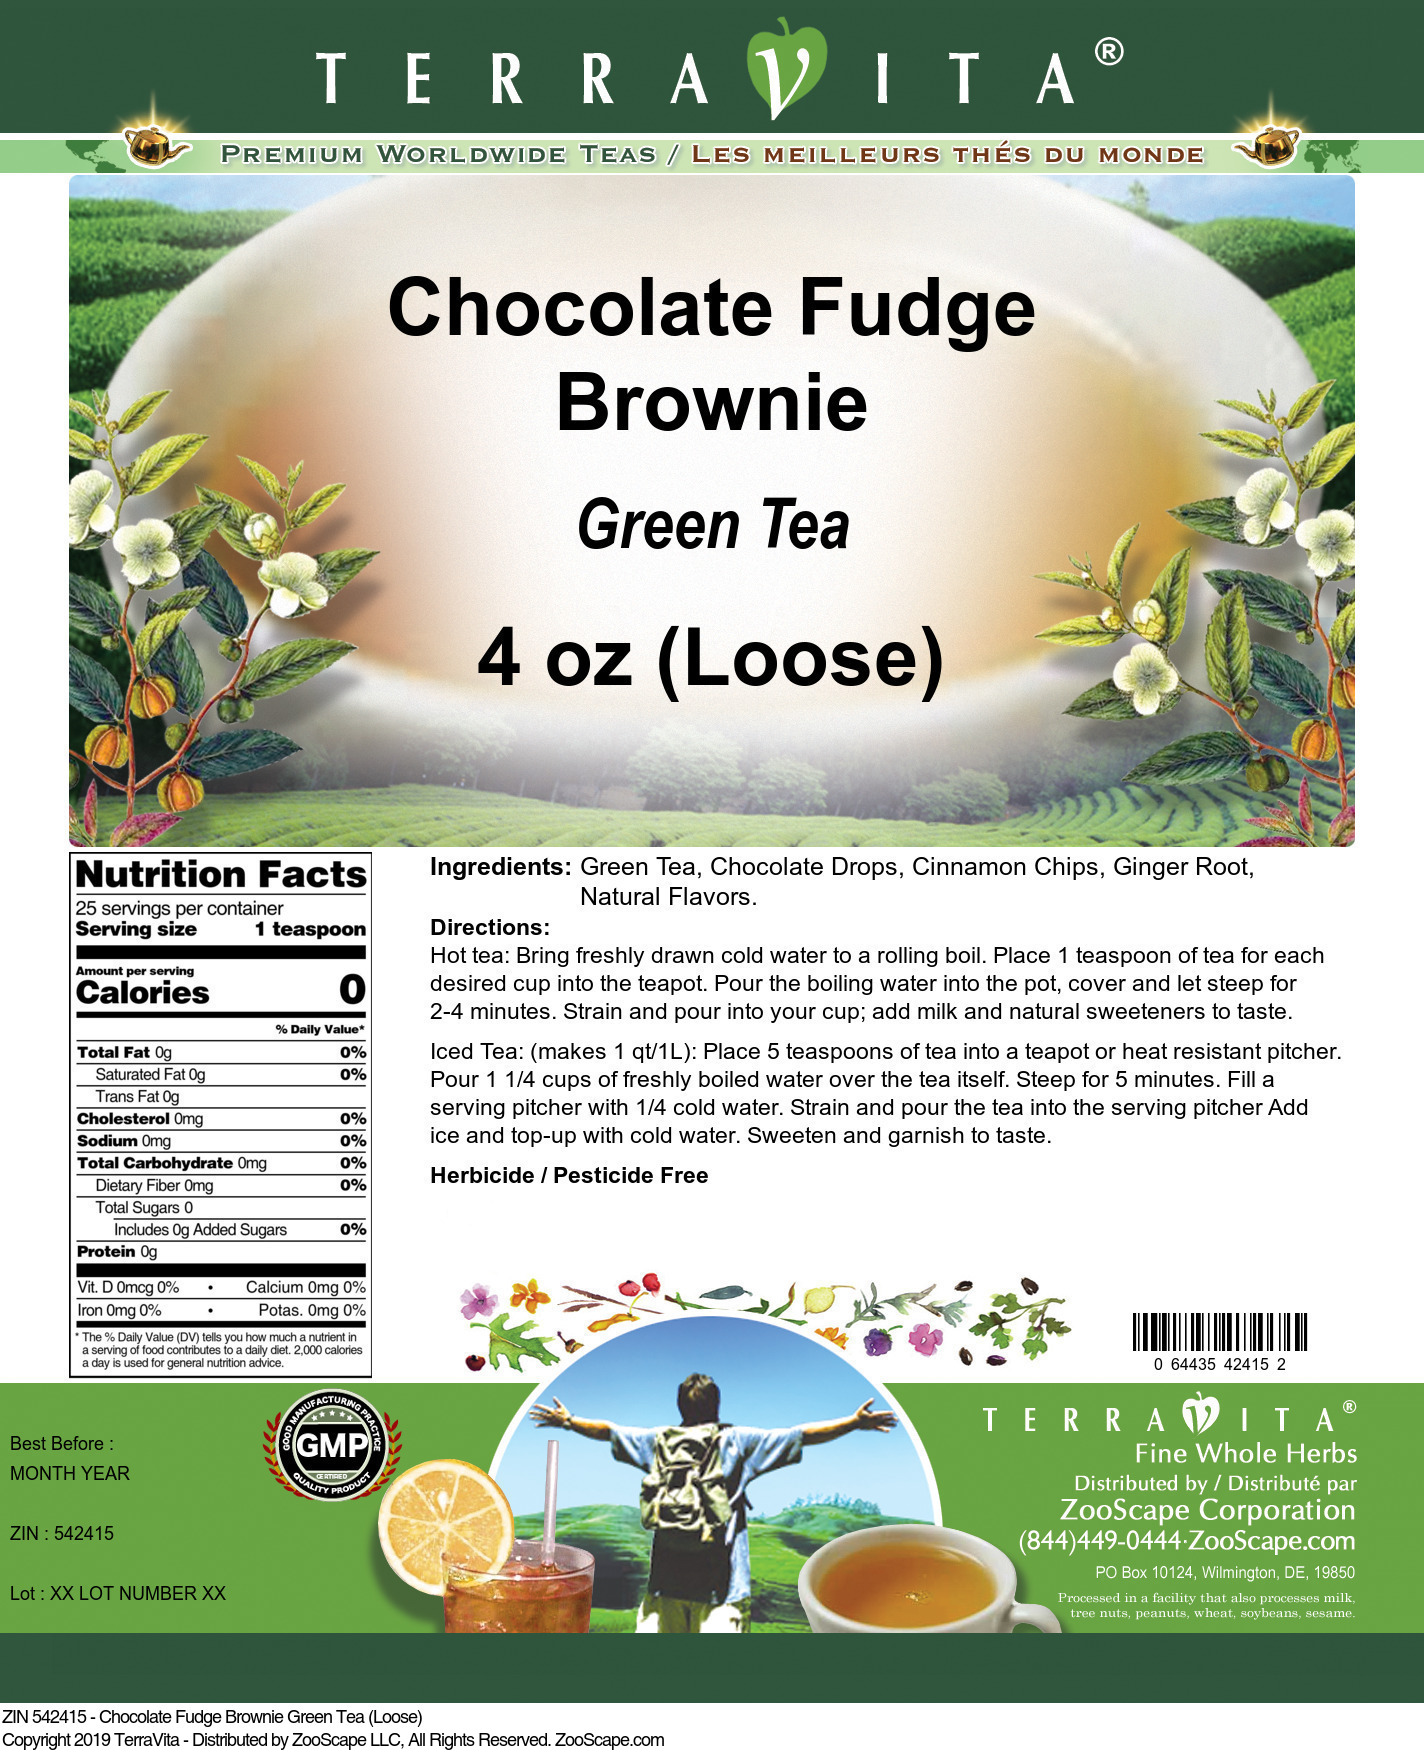 Chocolate Fudge Brownie Green Tea (Loose)